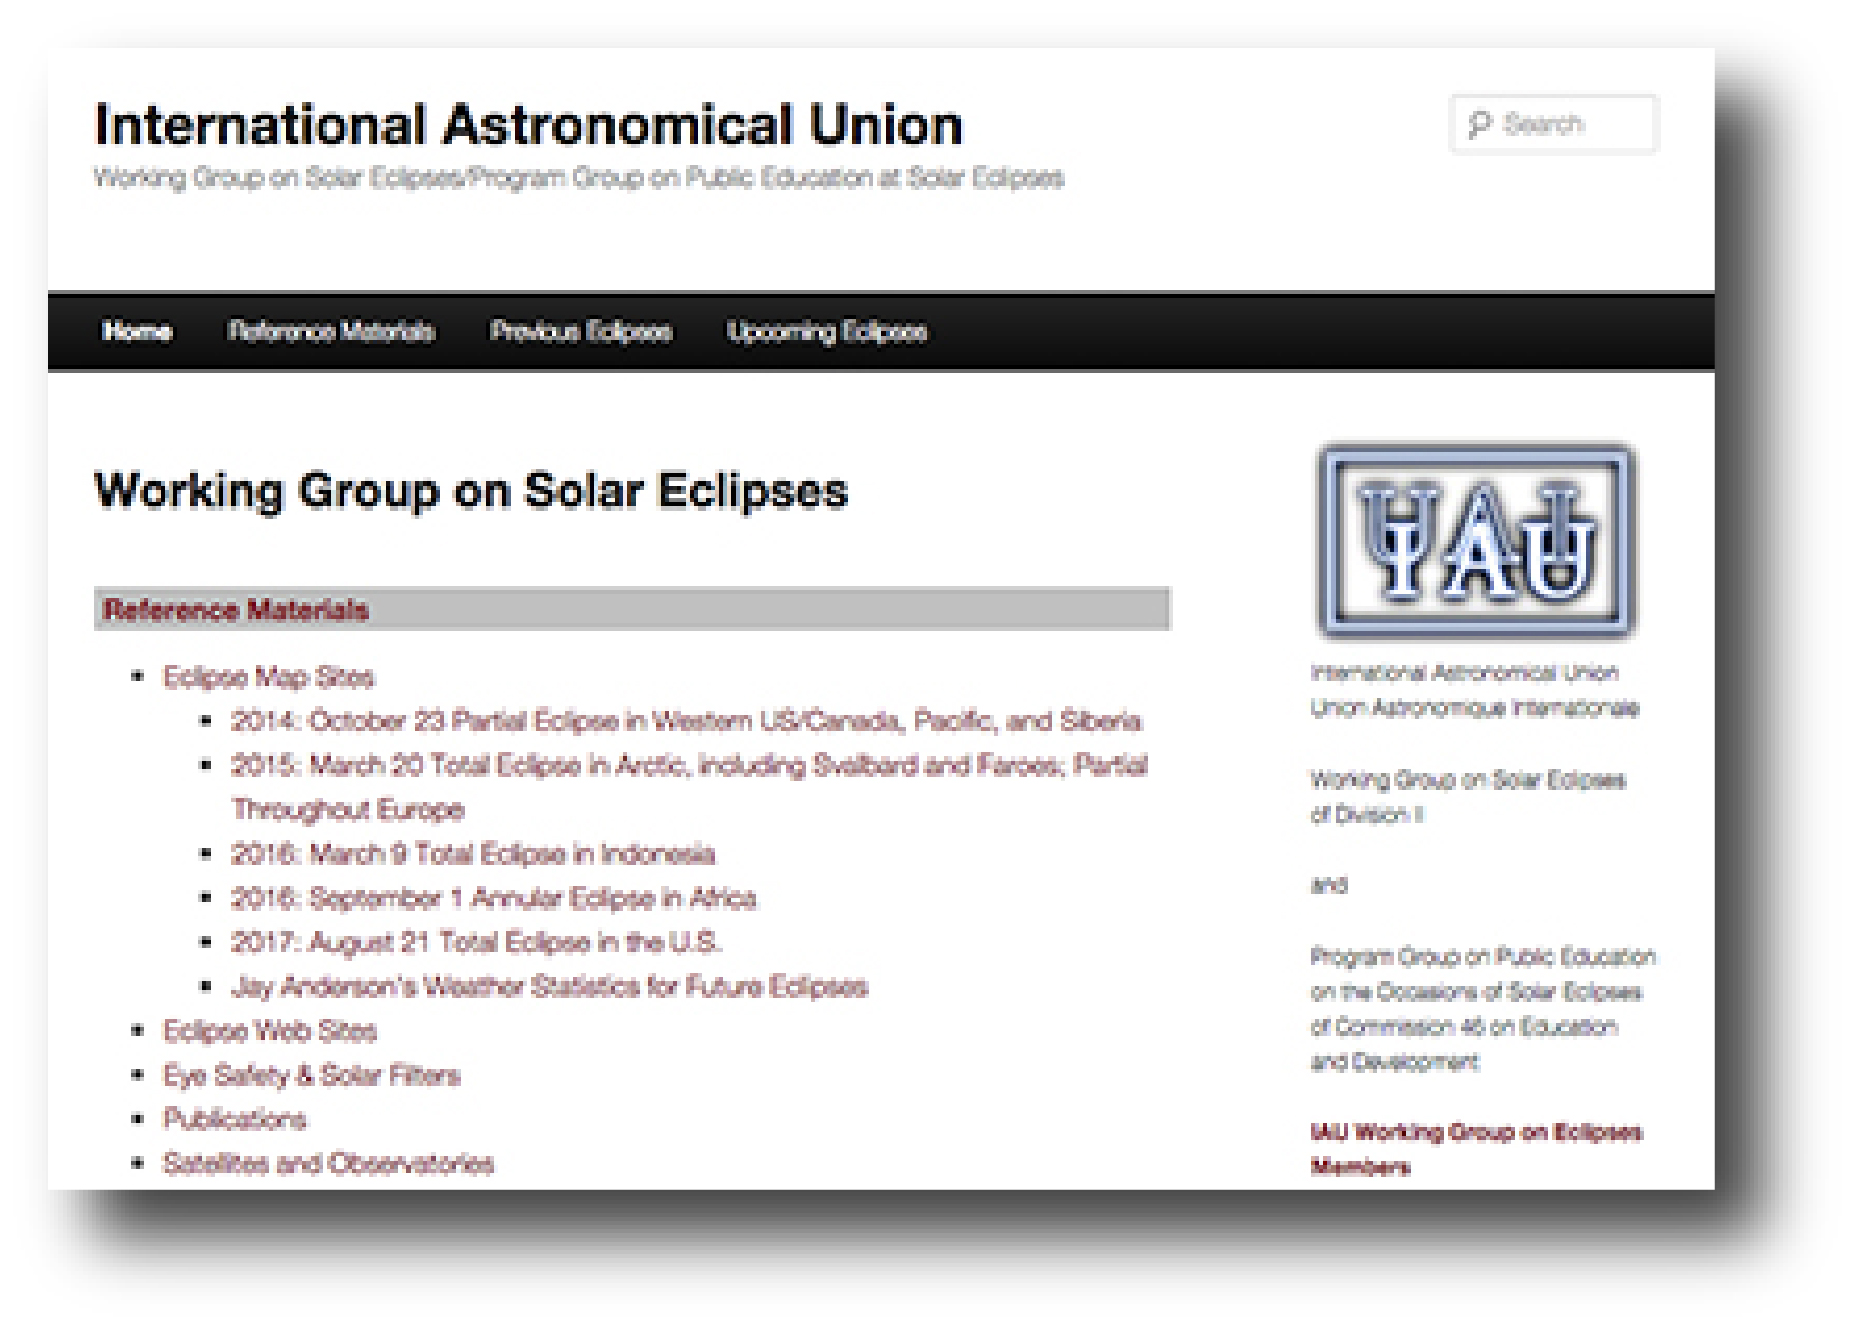 eclipses.info